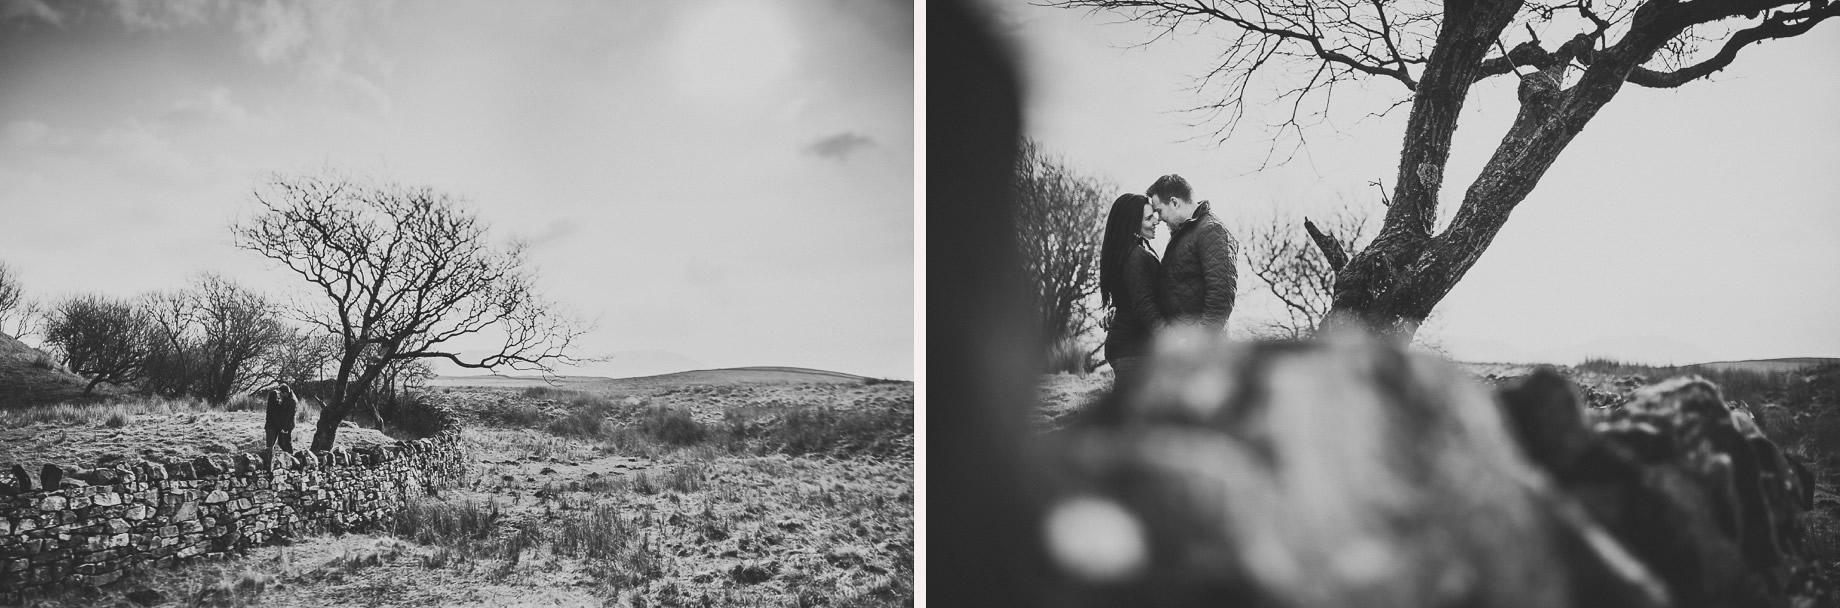 Rachael and Matt's Pre-Wedding Shoot at The Ribblehead Viaduct 023